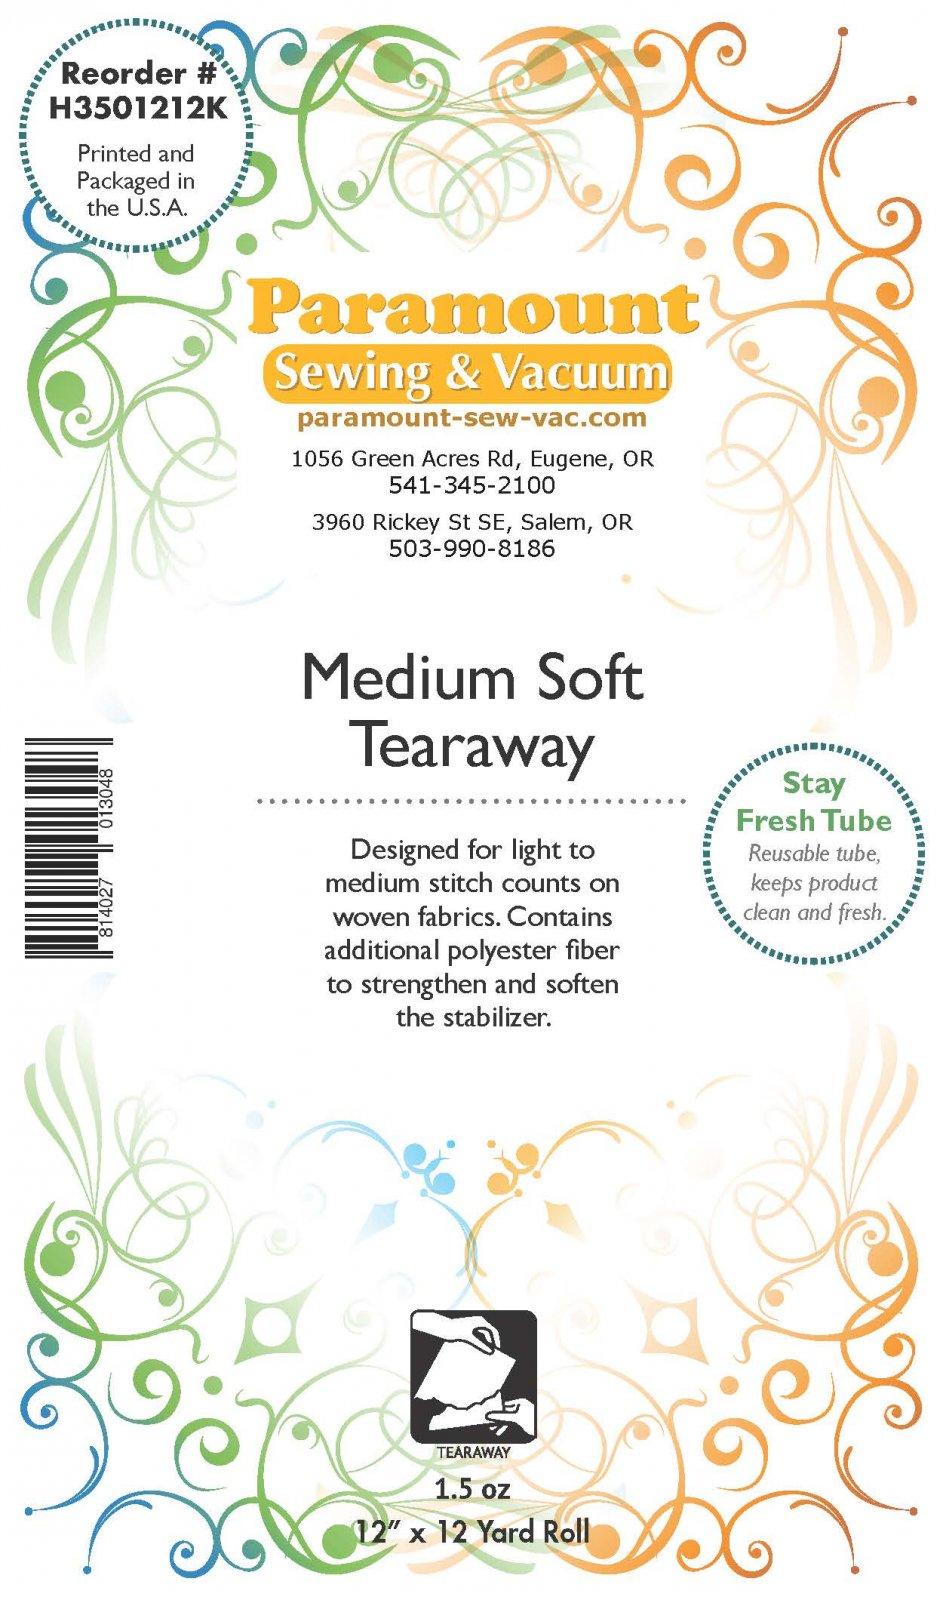 Paramount Stabilizer: Medium Soft Tearaway